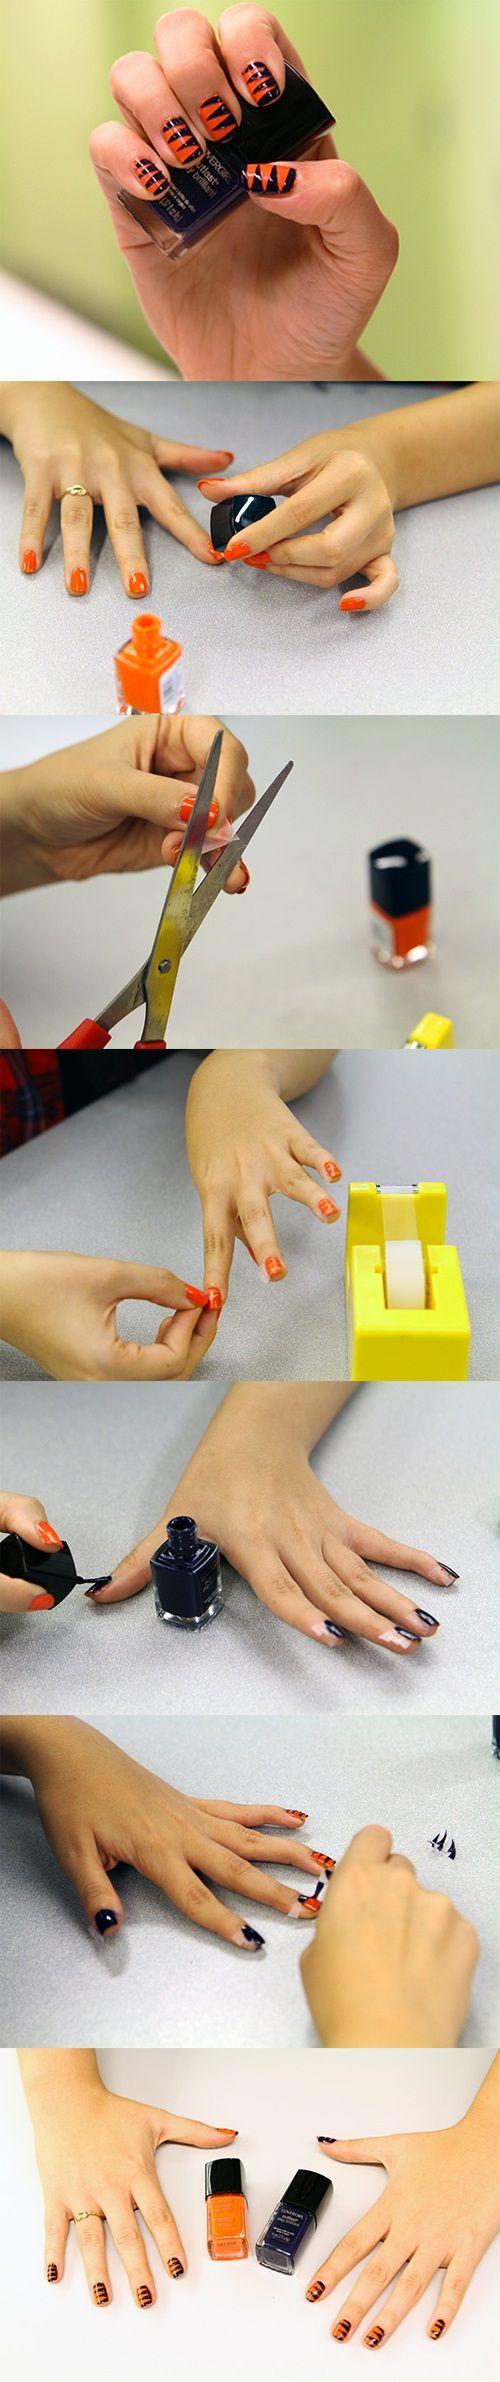 19 best Broncos nails images on Pinterest   Broncos nails, Super ...